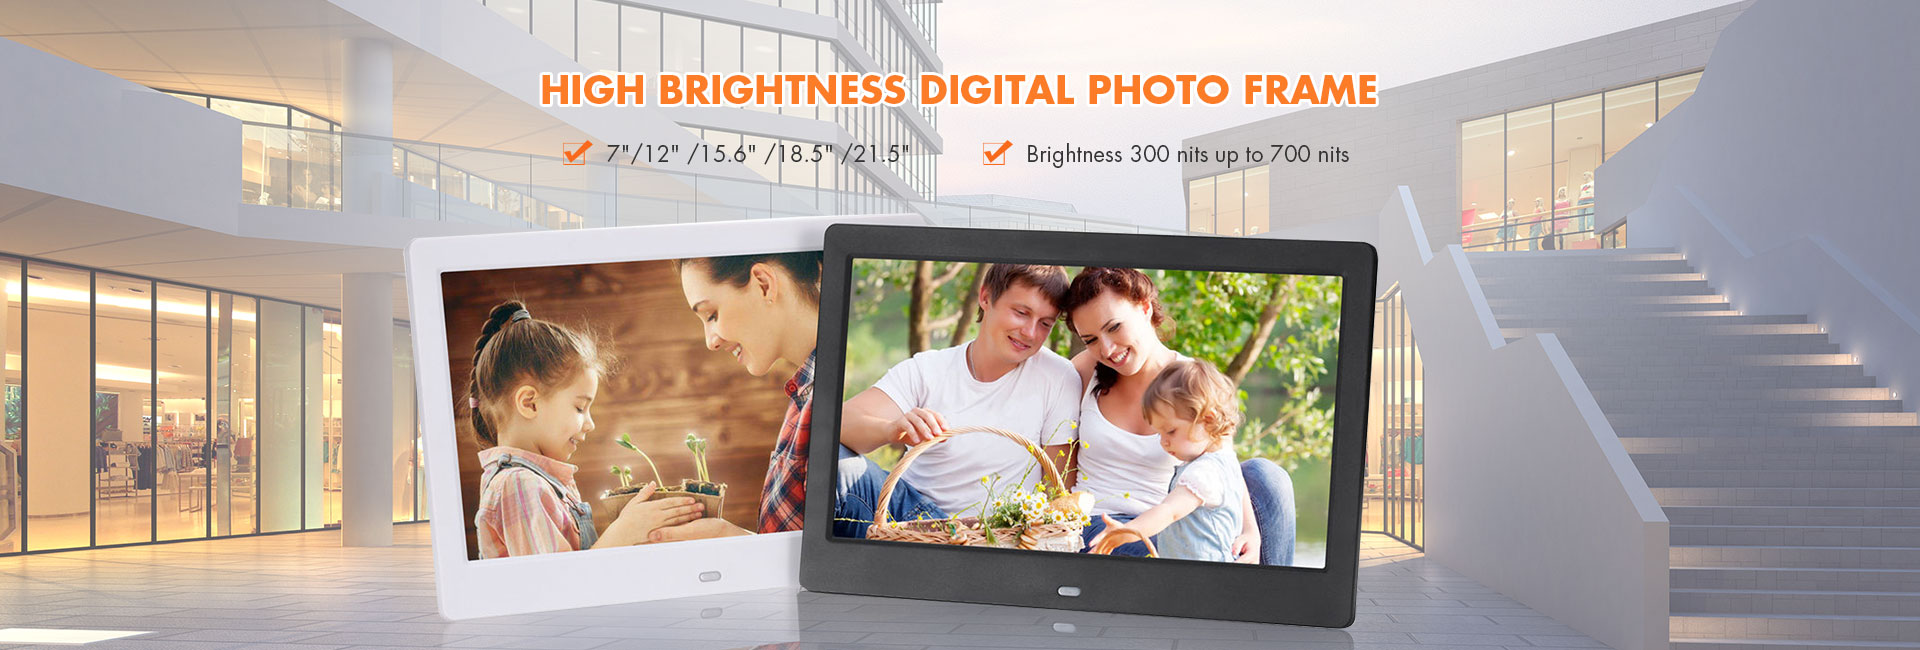 Vertical Screen Digital Photo Frame